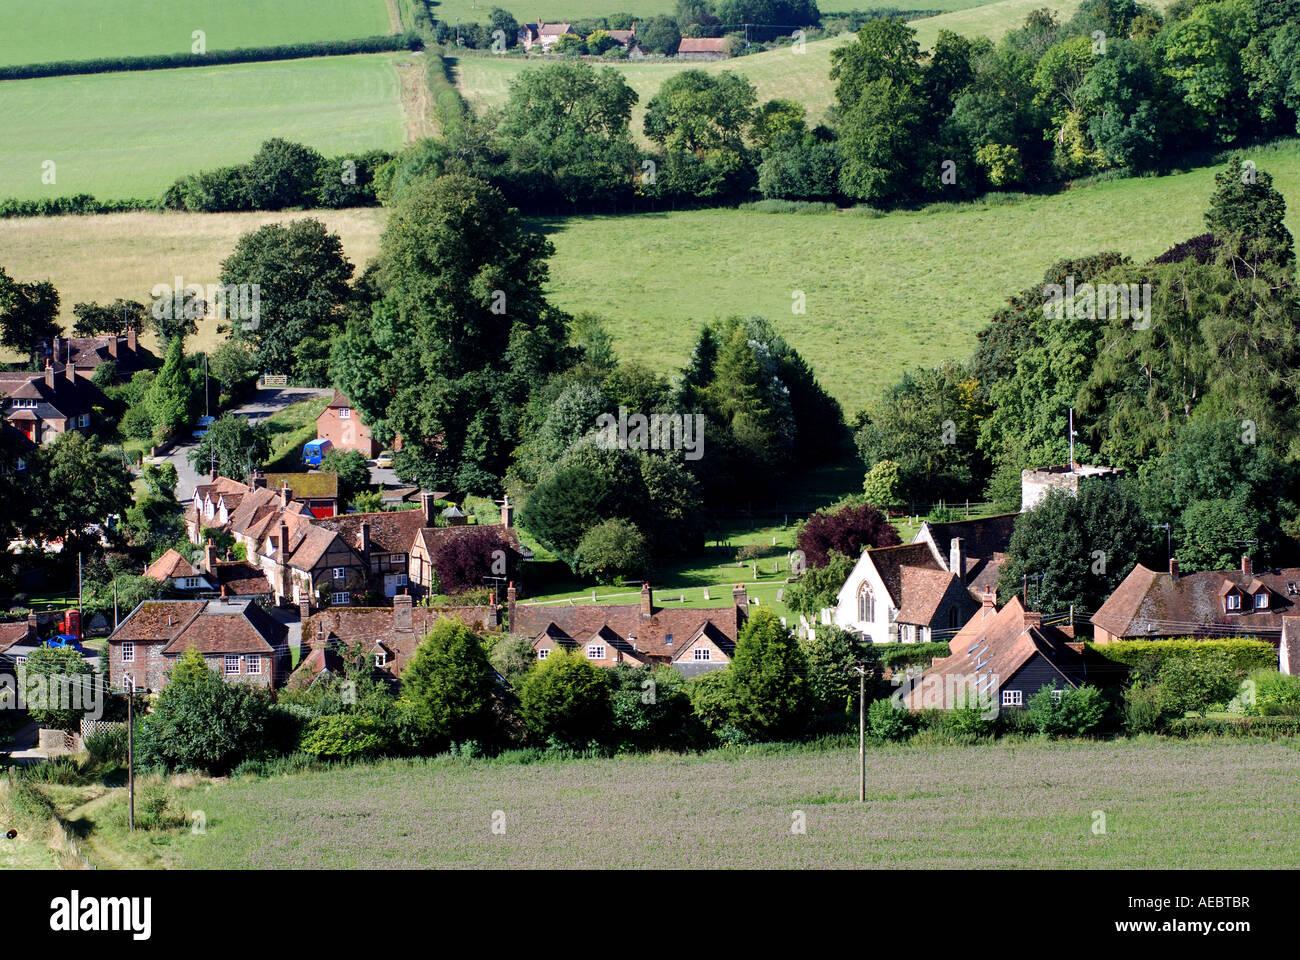 Turville village, Buckinghamshire, England, UK - Stock Image